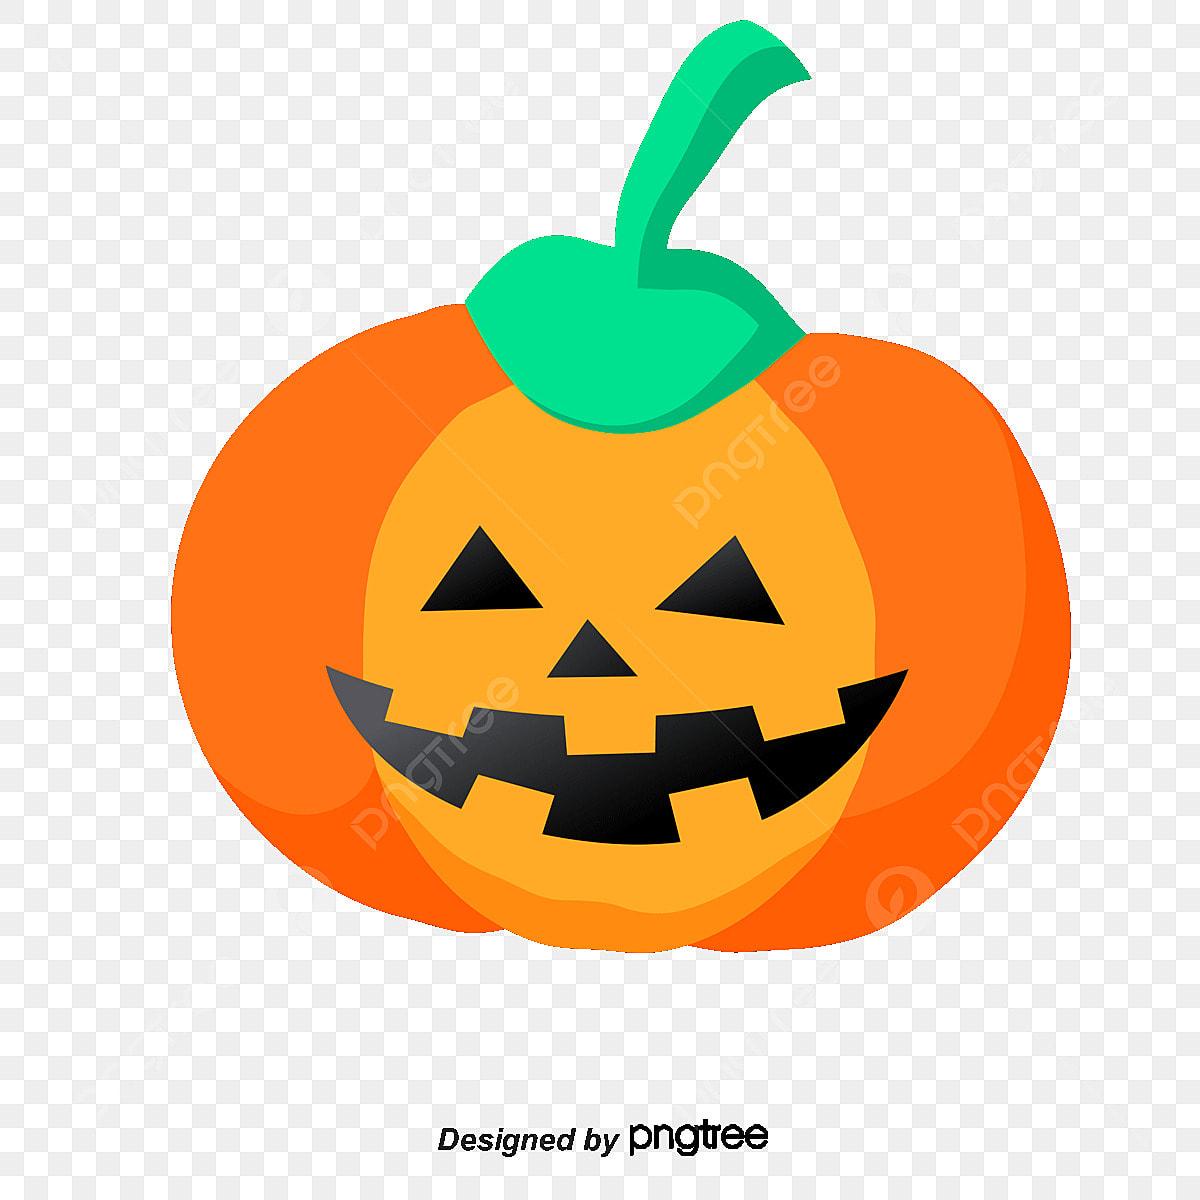 Halloween Pumpkin Vector.Halloween Pumpkin Vector Material Halloween Pumpkin Orange Png